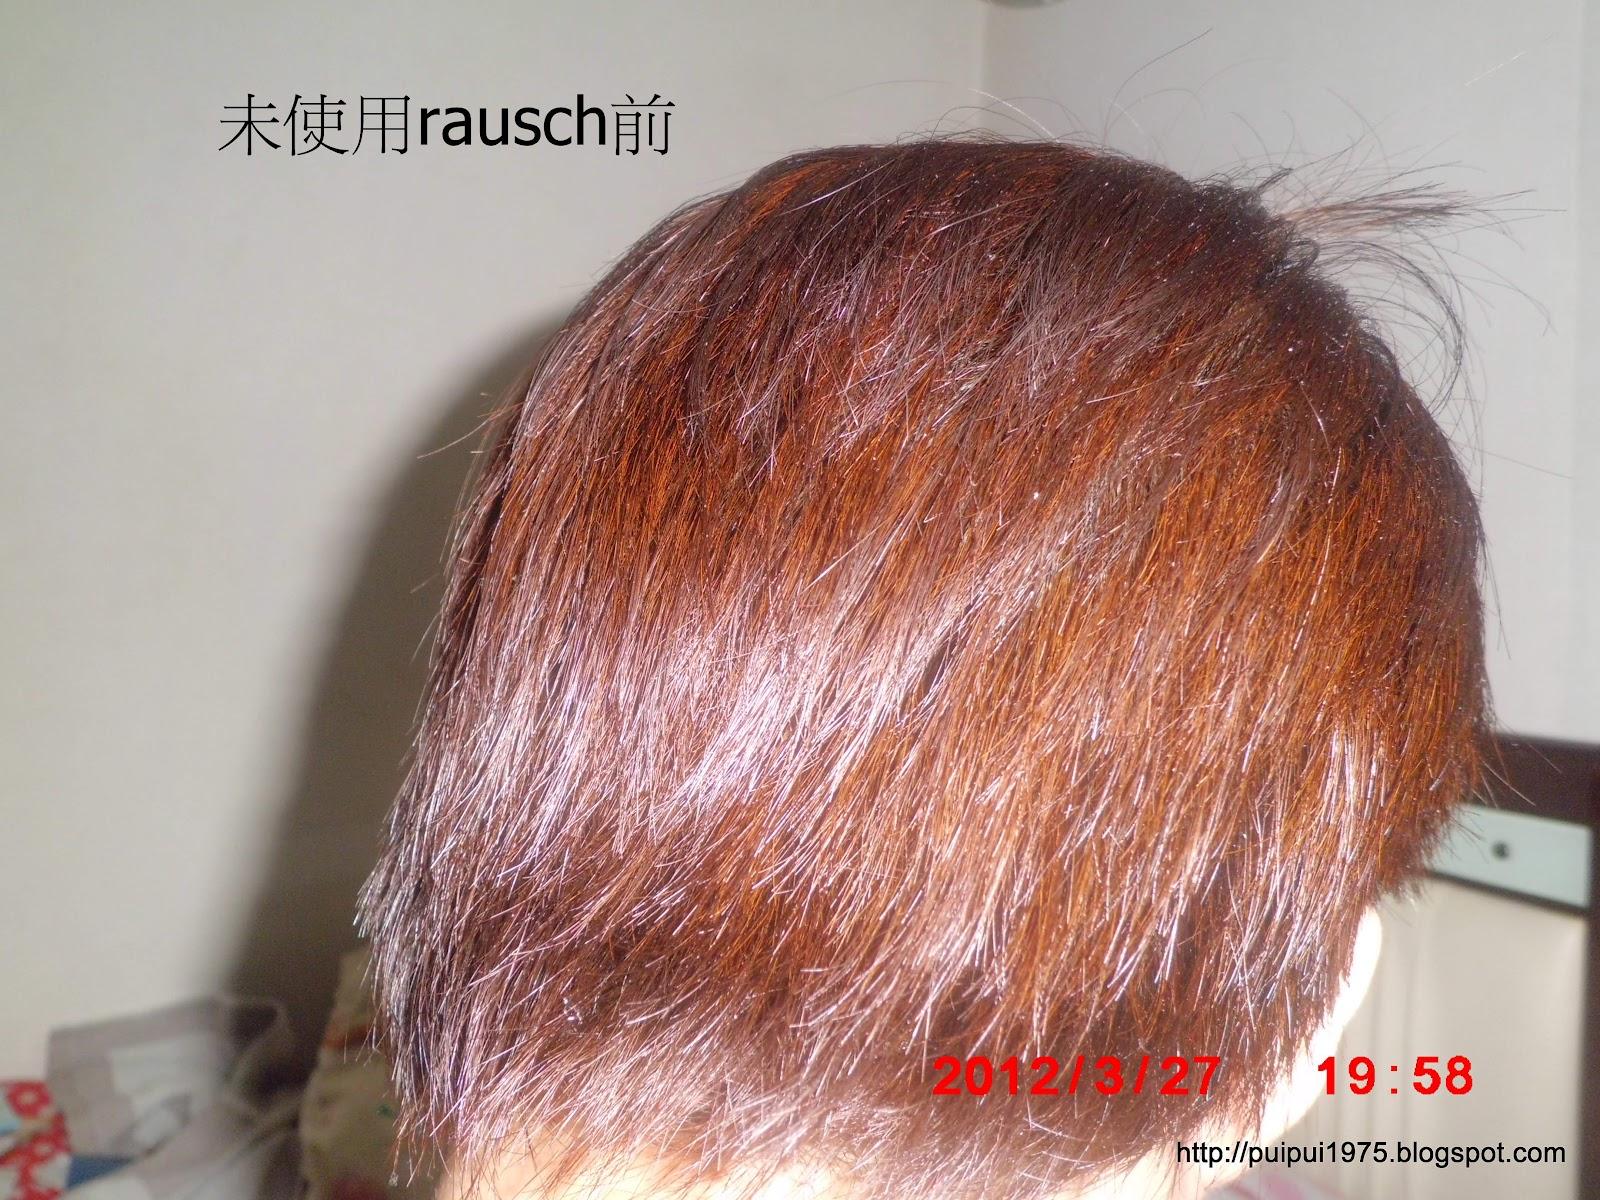 BEAUTY天地: 使用rausch款冬洗頭水有肋頭皮敏感